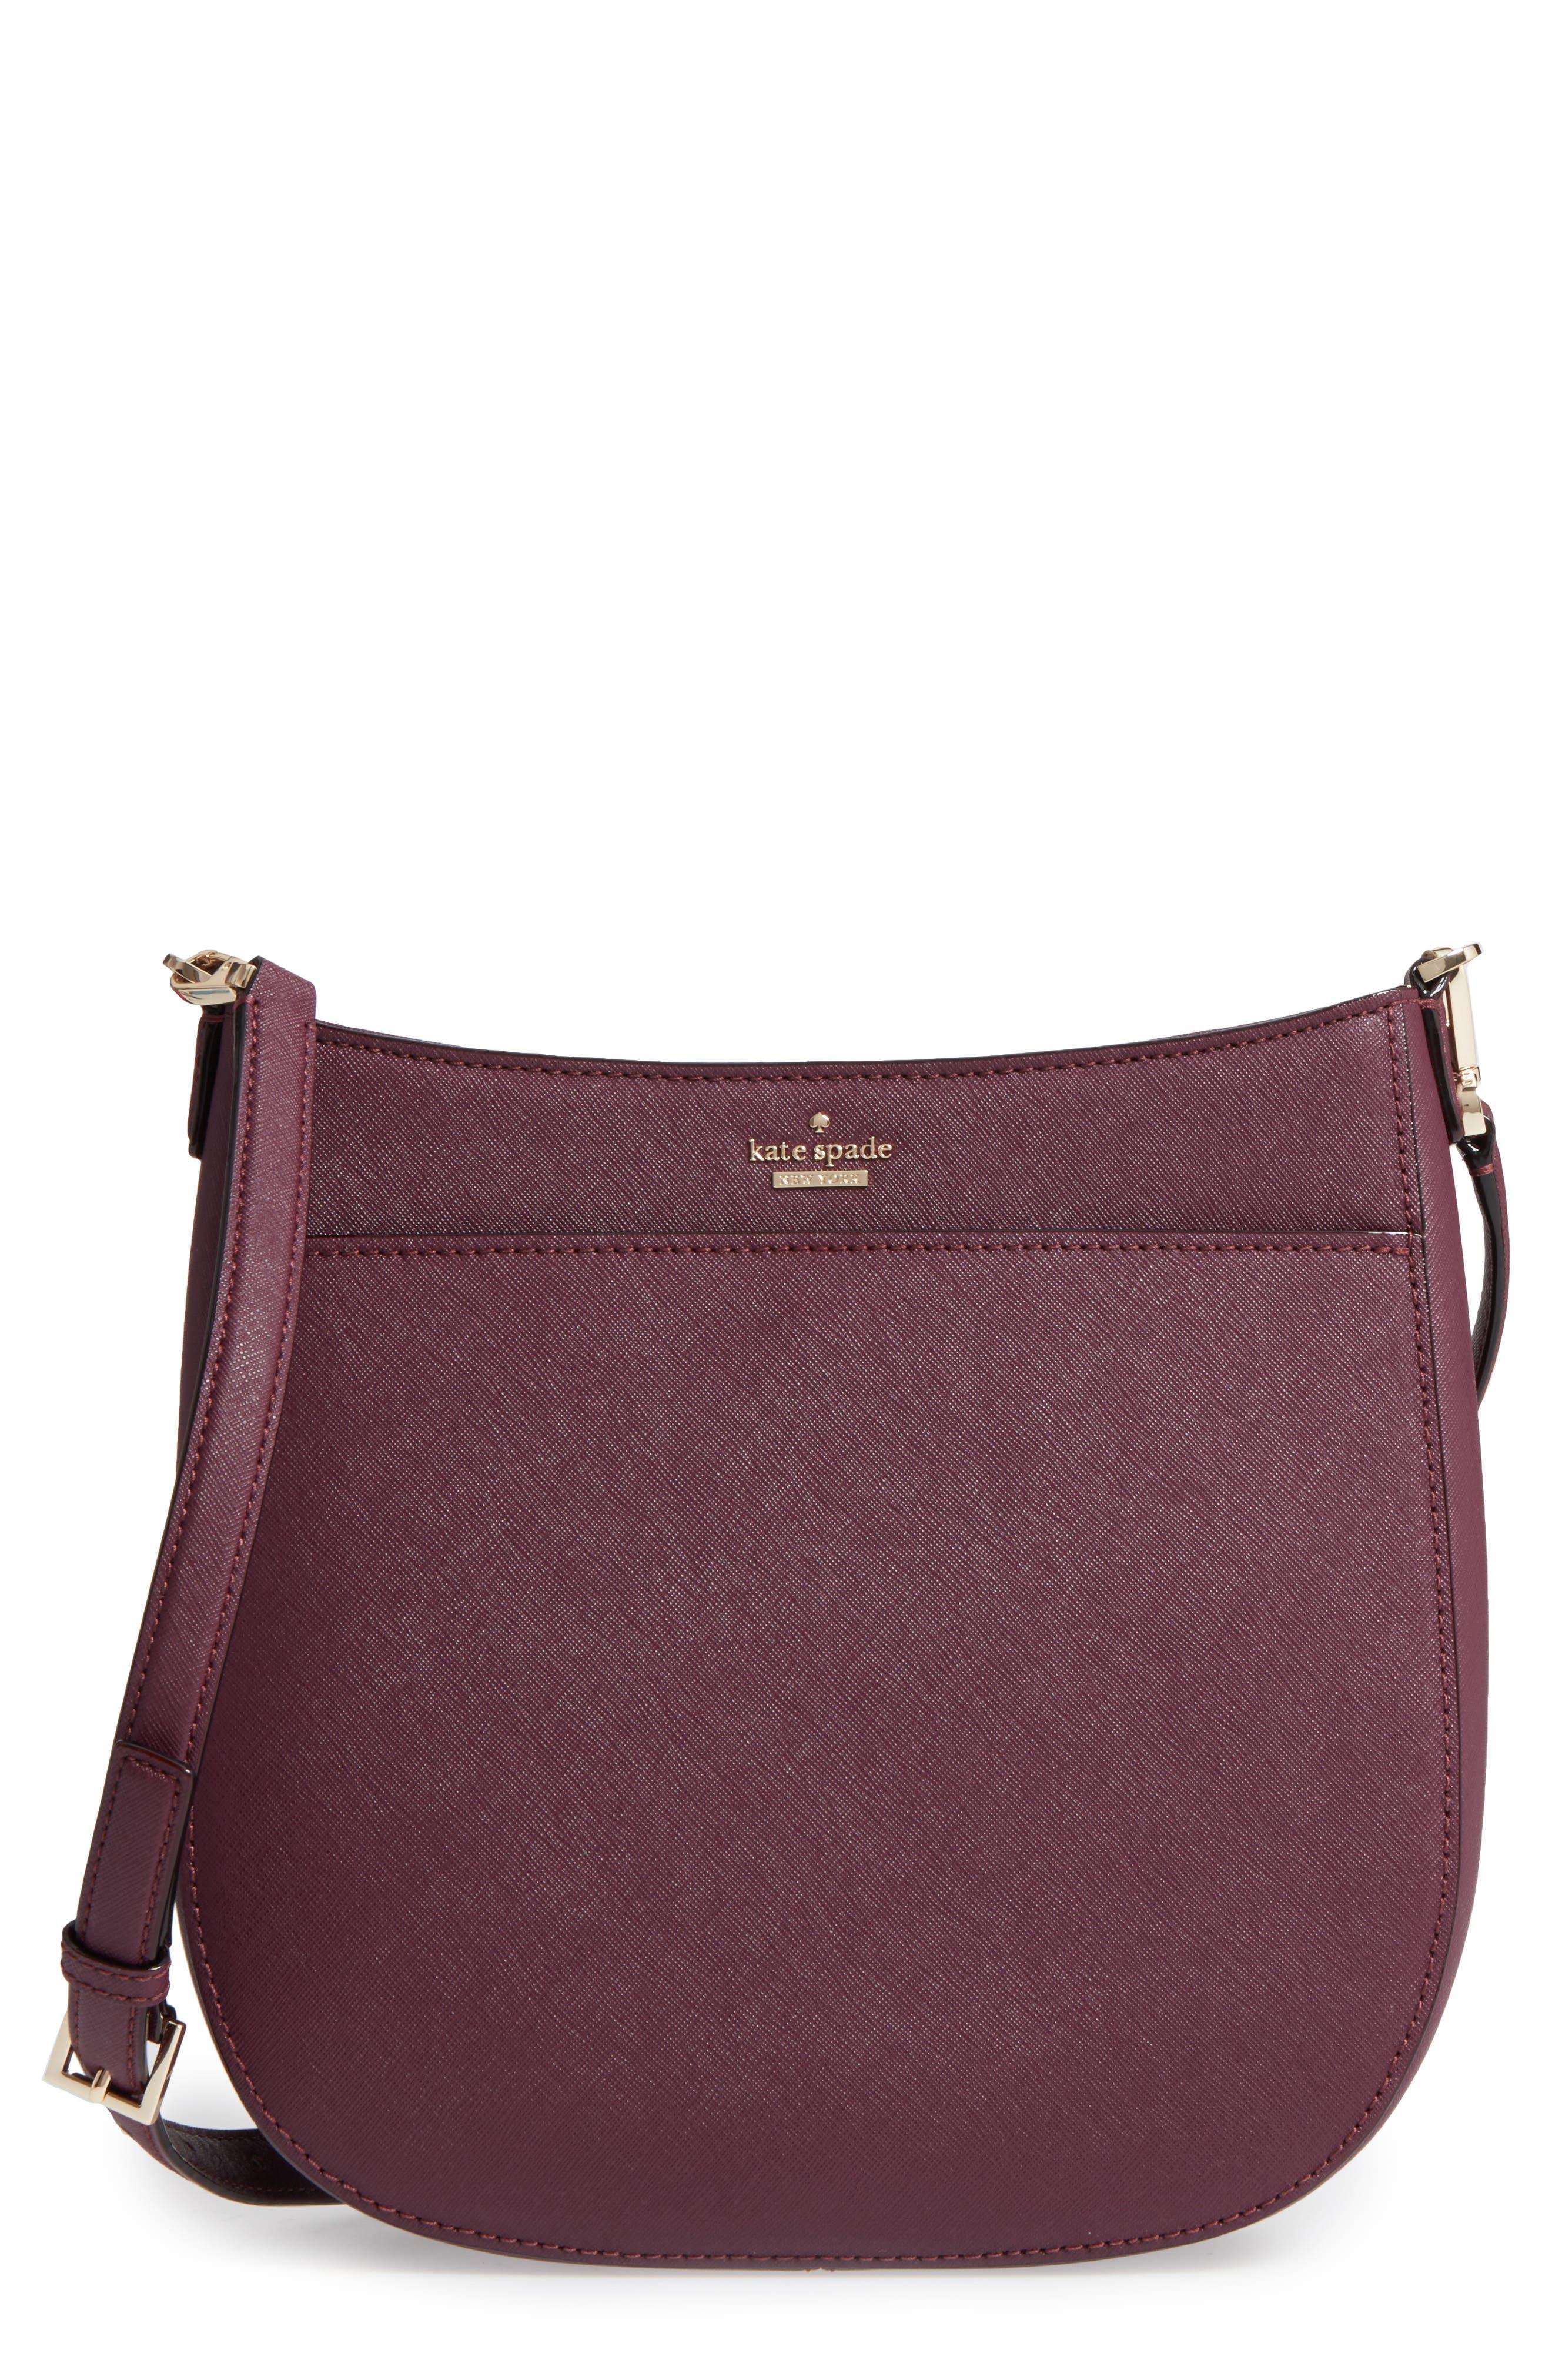 cameron street - robin leather crossbody bag,                         Main,                         color, Deep Plum